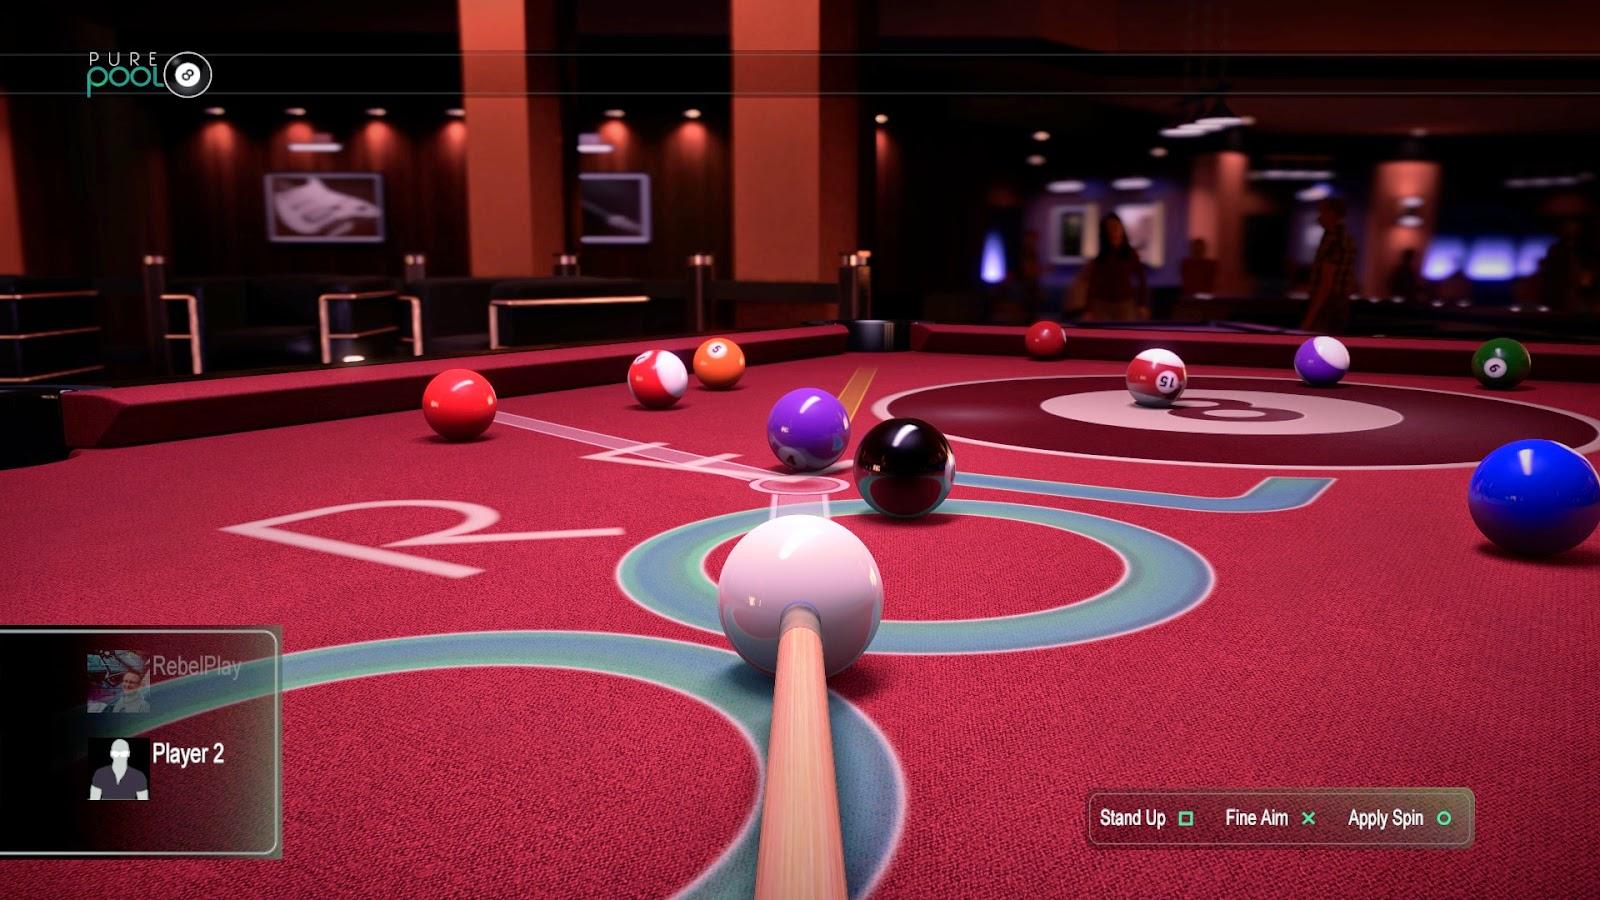 Download pure pool torrent pc fraco torrent games - Pooltoren ...